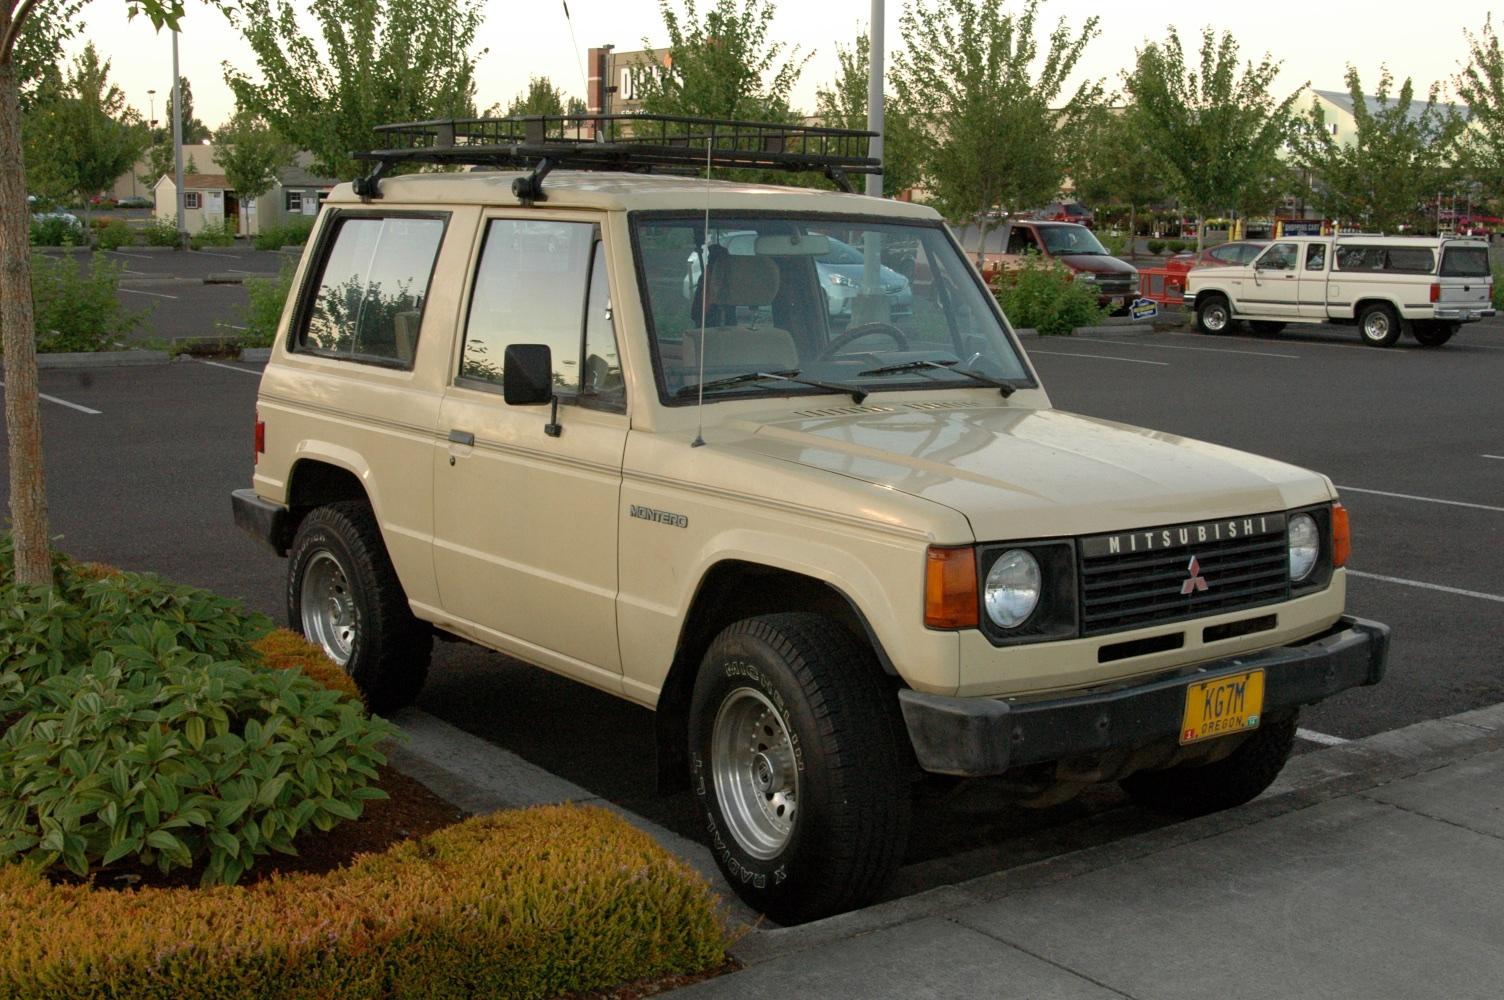 Old Parked Cars 1983 Mitsubishi Montero